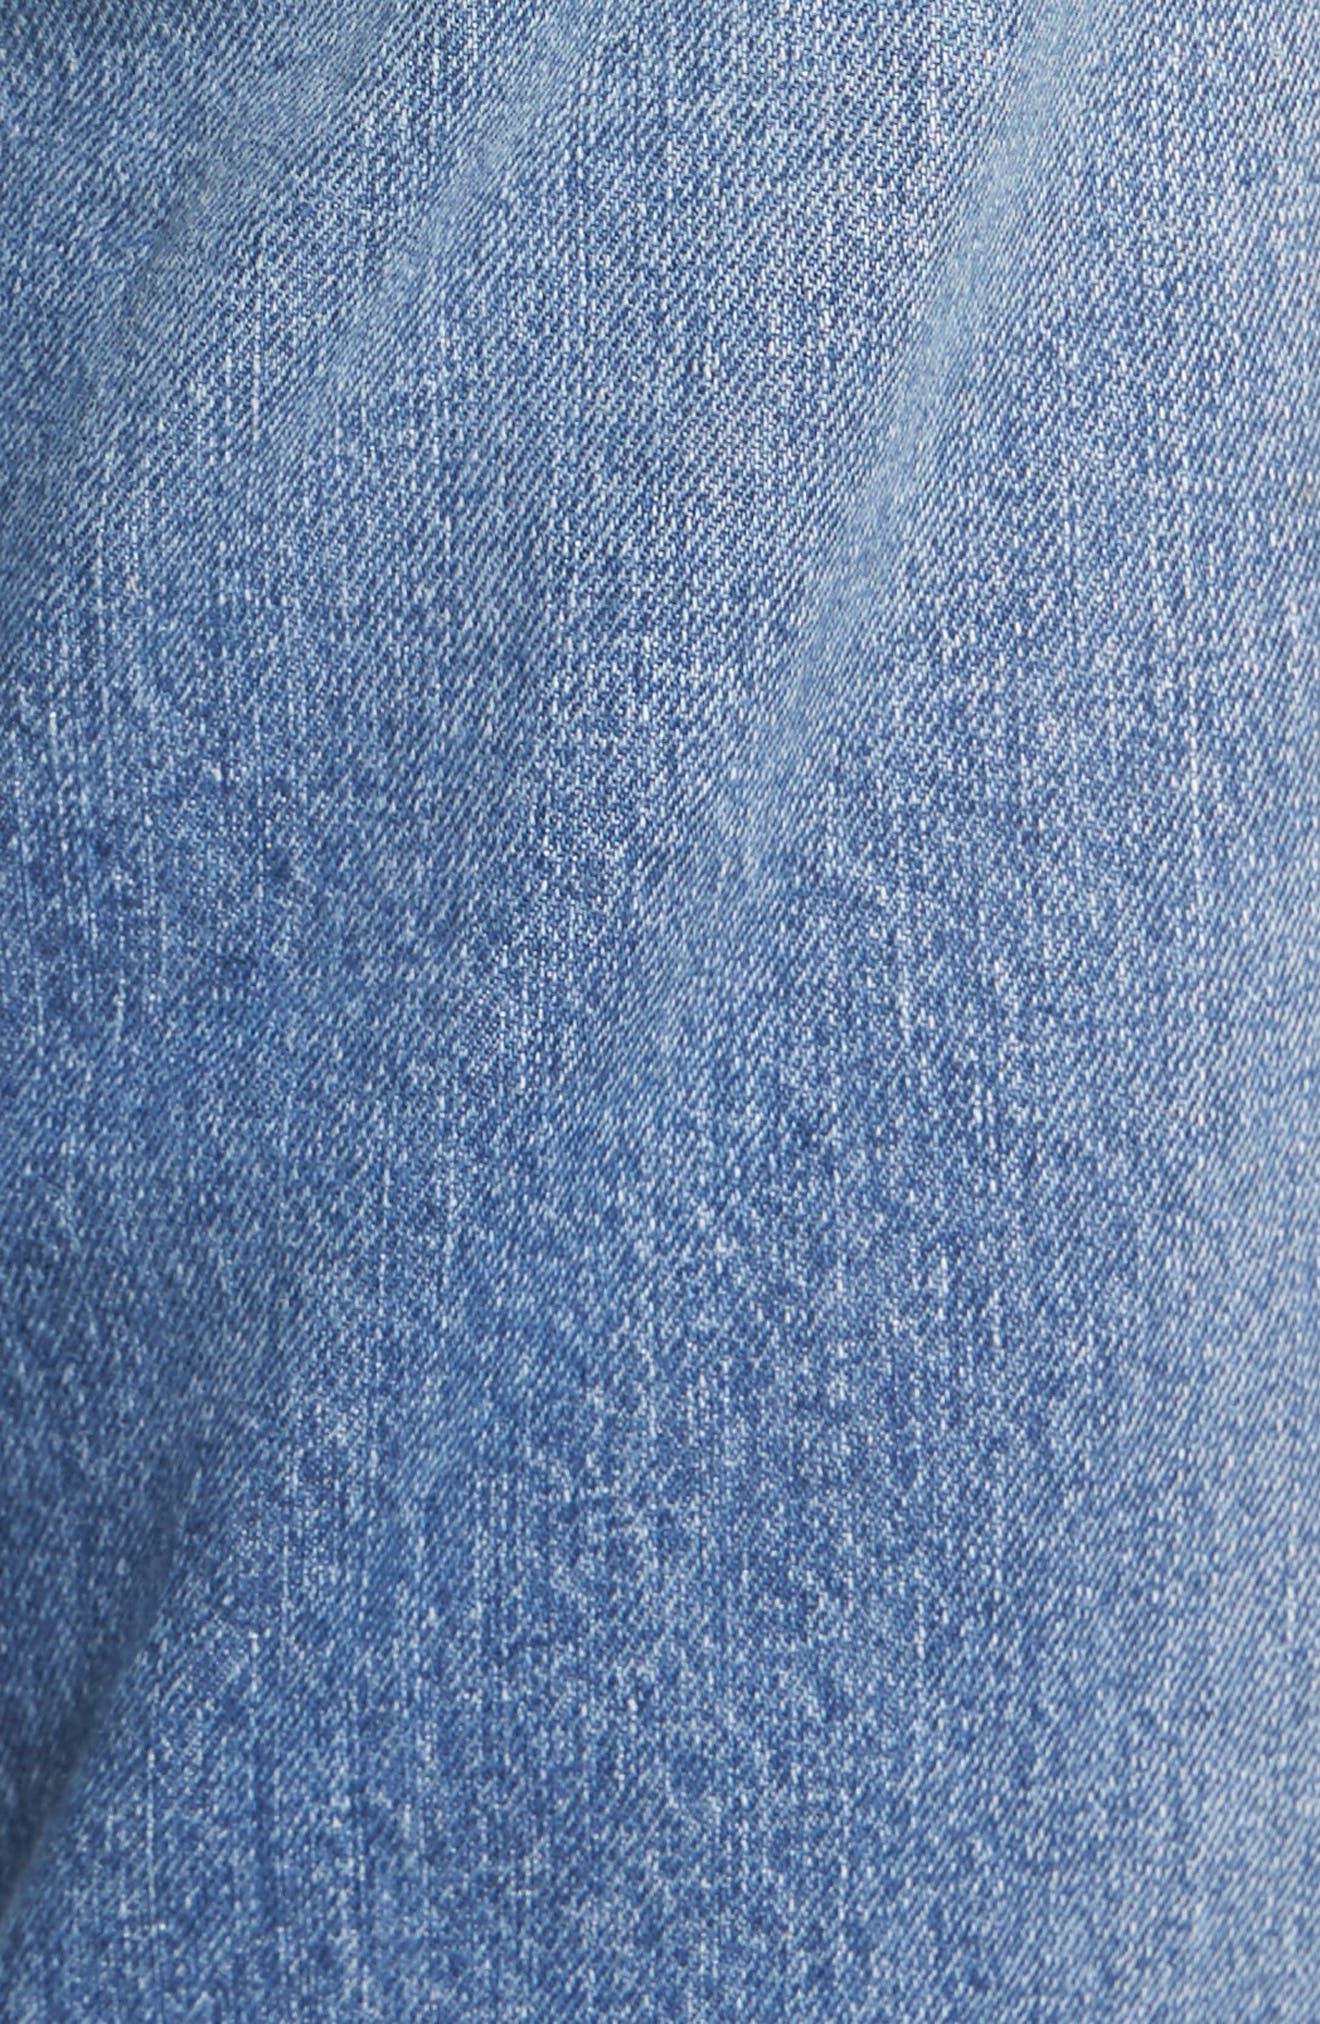 Taylor Ripped Crop Boyfriend Jeans,                             Alternate thumbnail 5, color,                             400